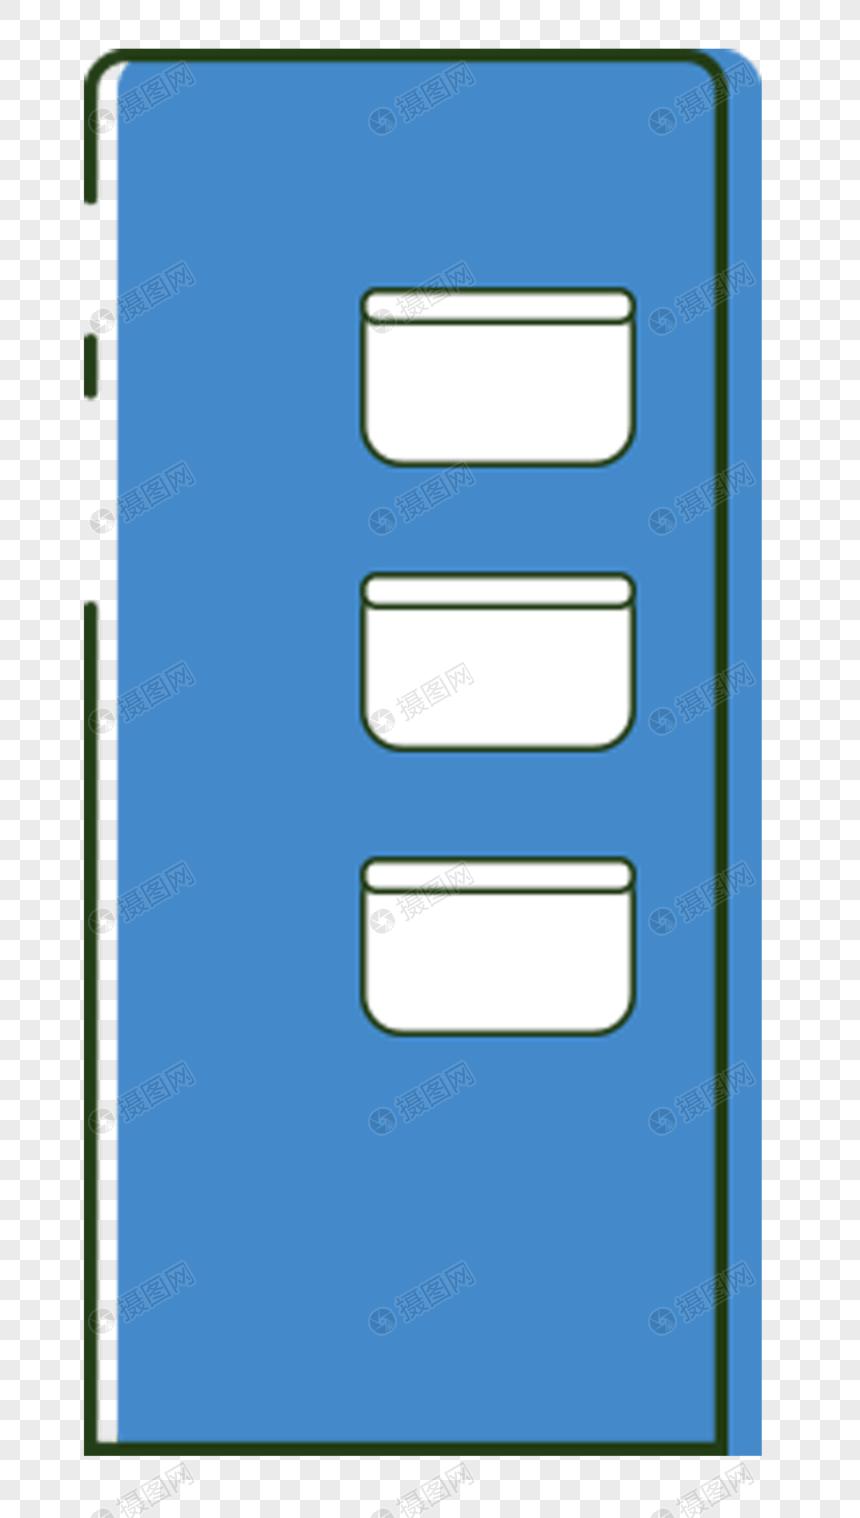 Gambar Bis Animasi : gambar, animasi, Door,, Window, Image_picture, Download, 400238694_lovepik.com